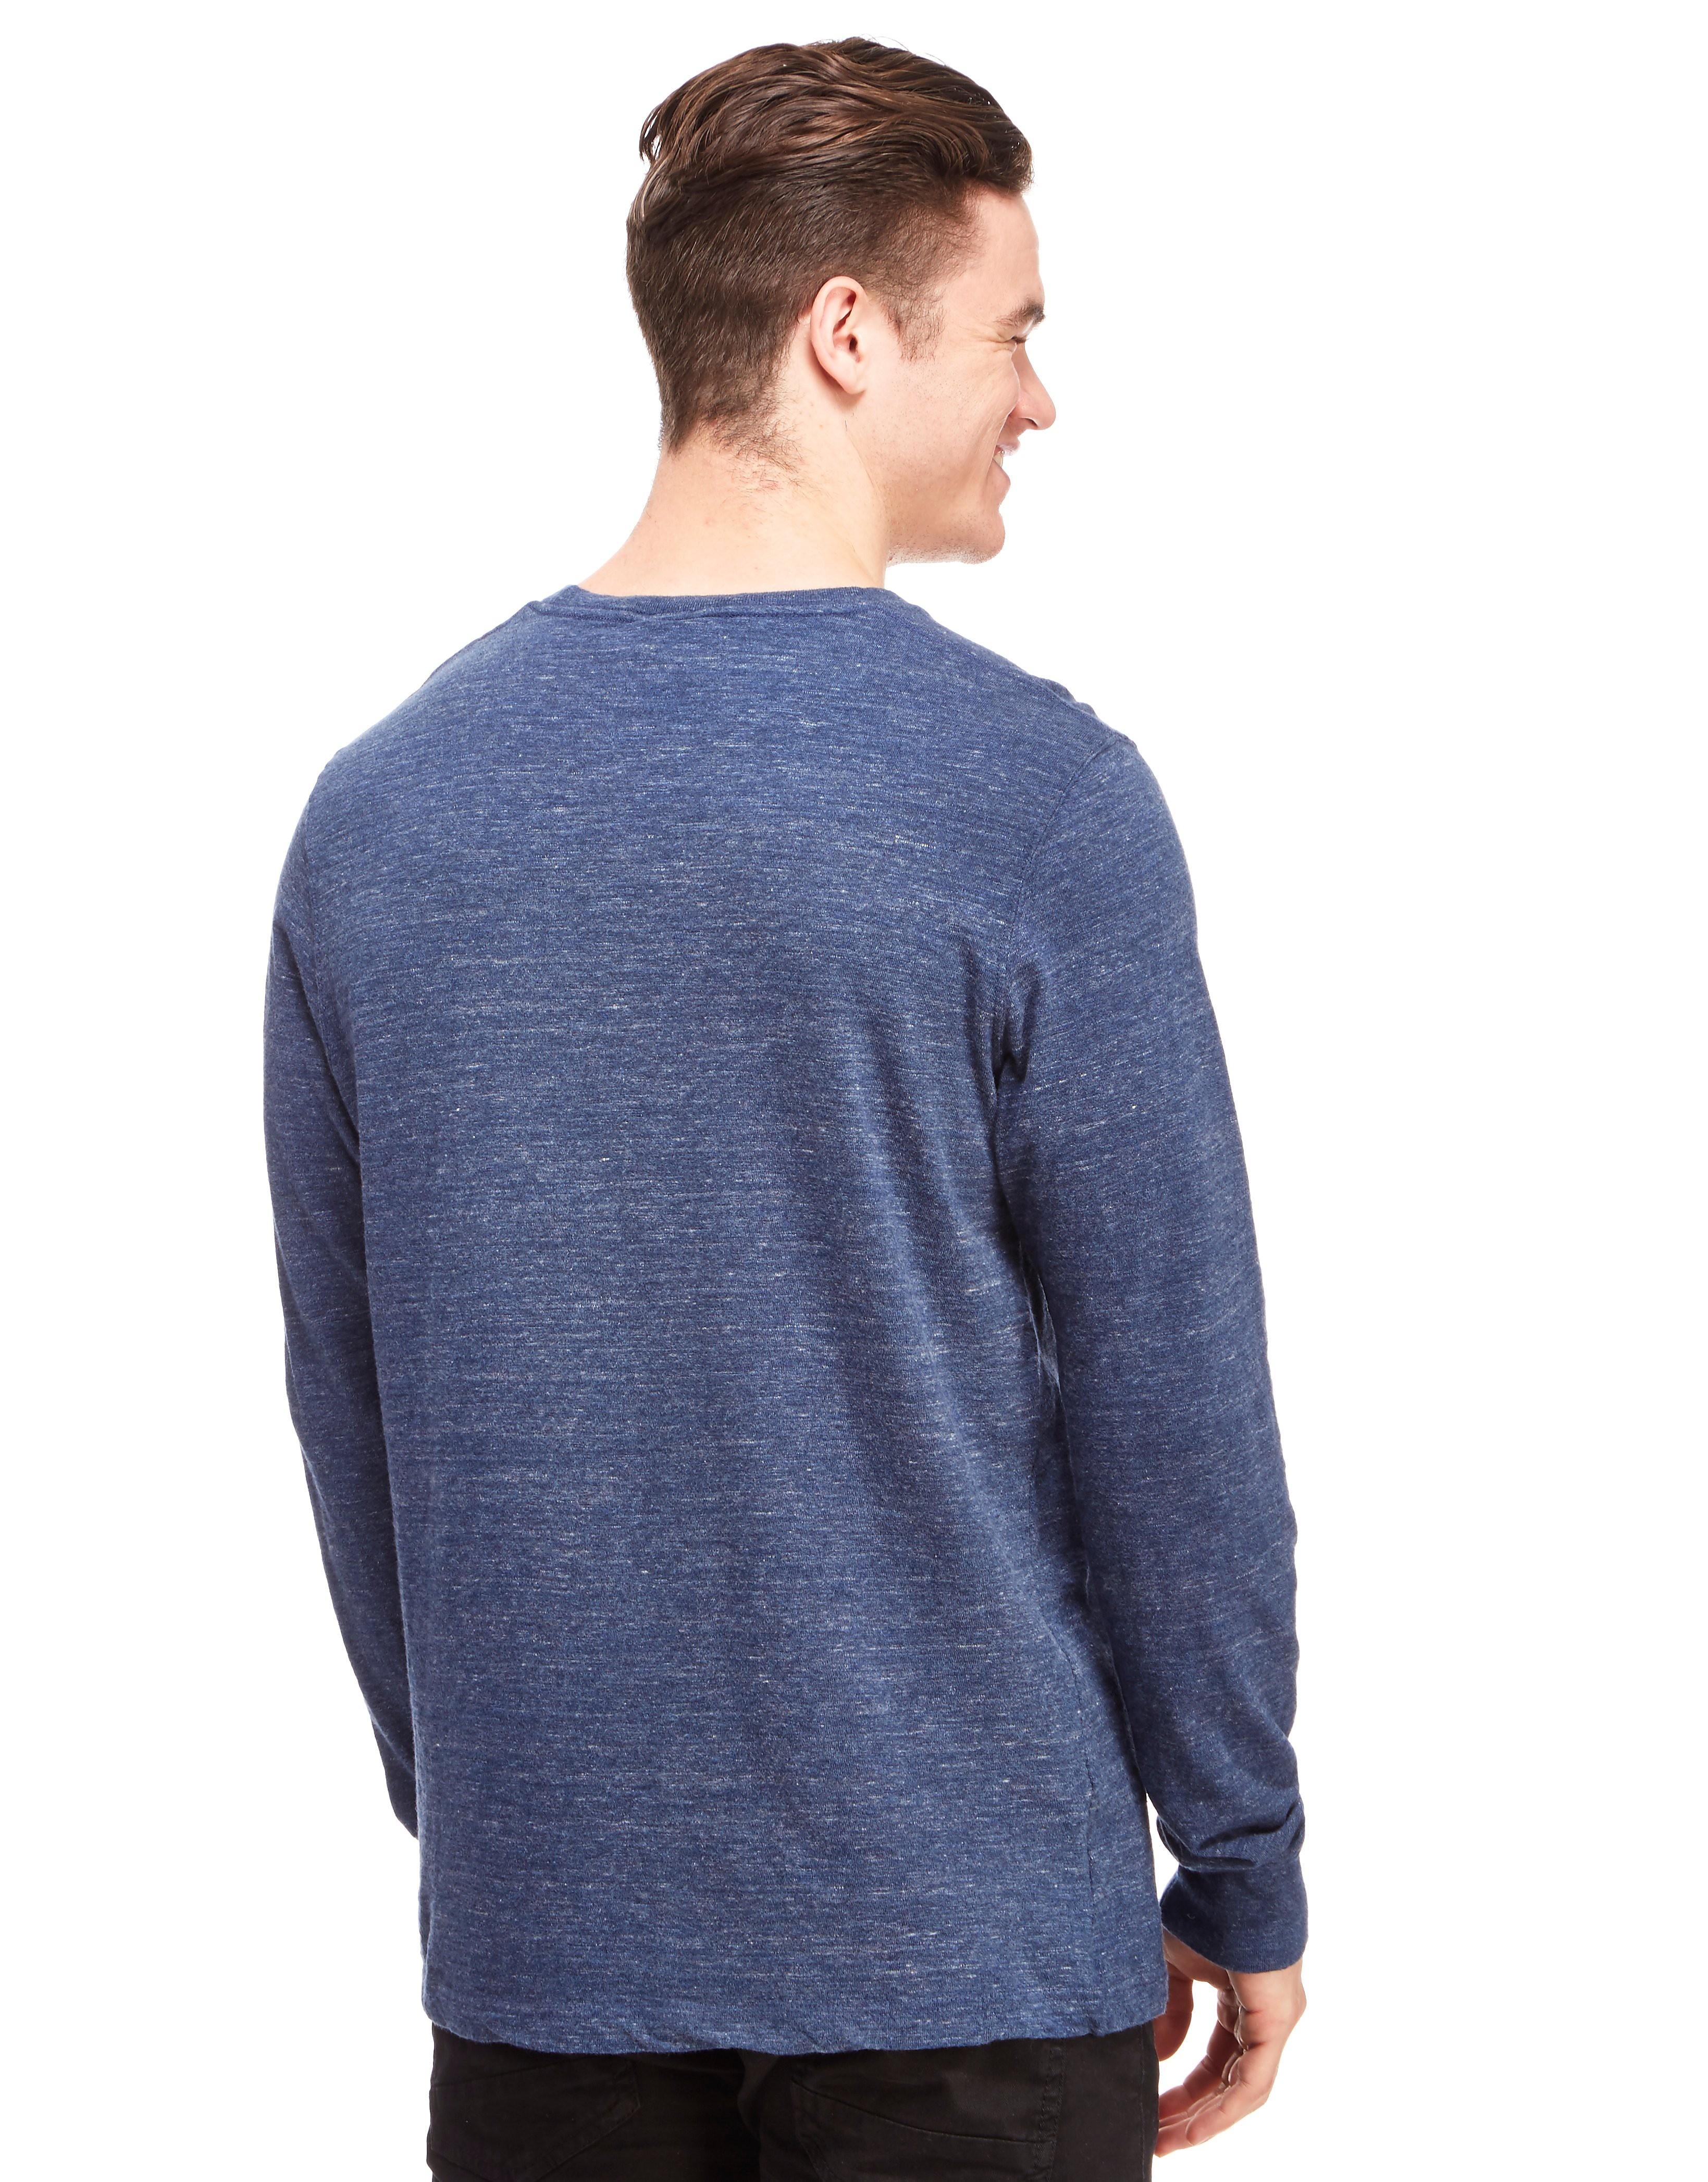 Franklin & Marshall Pocket Long Sleeve T-Shirt